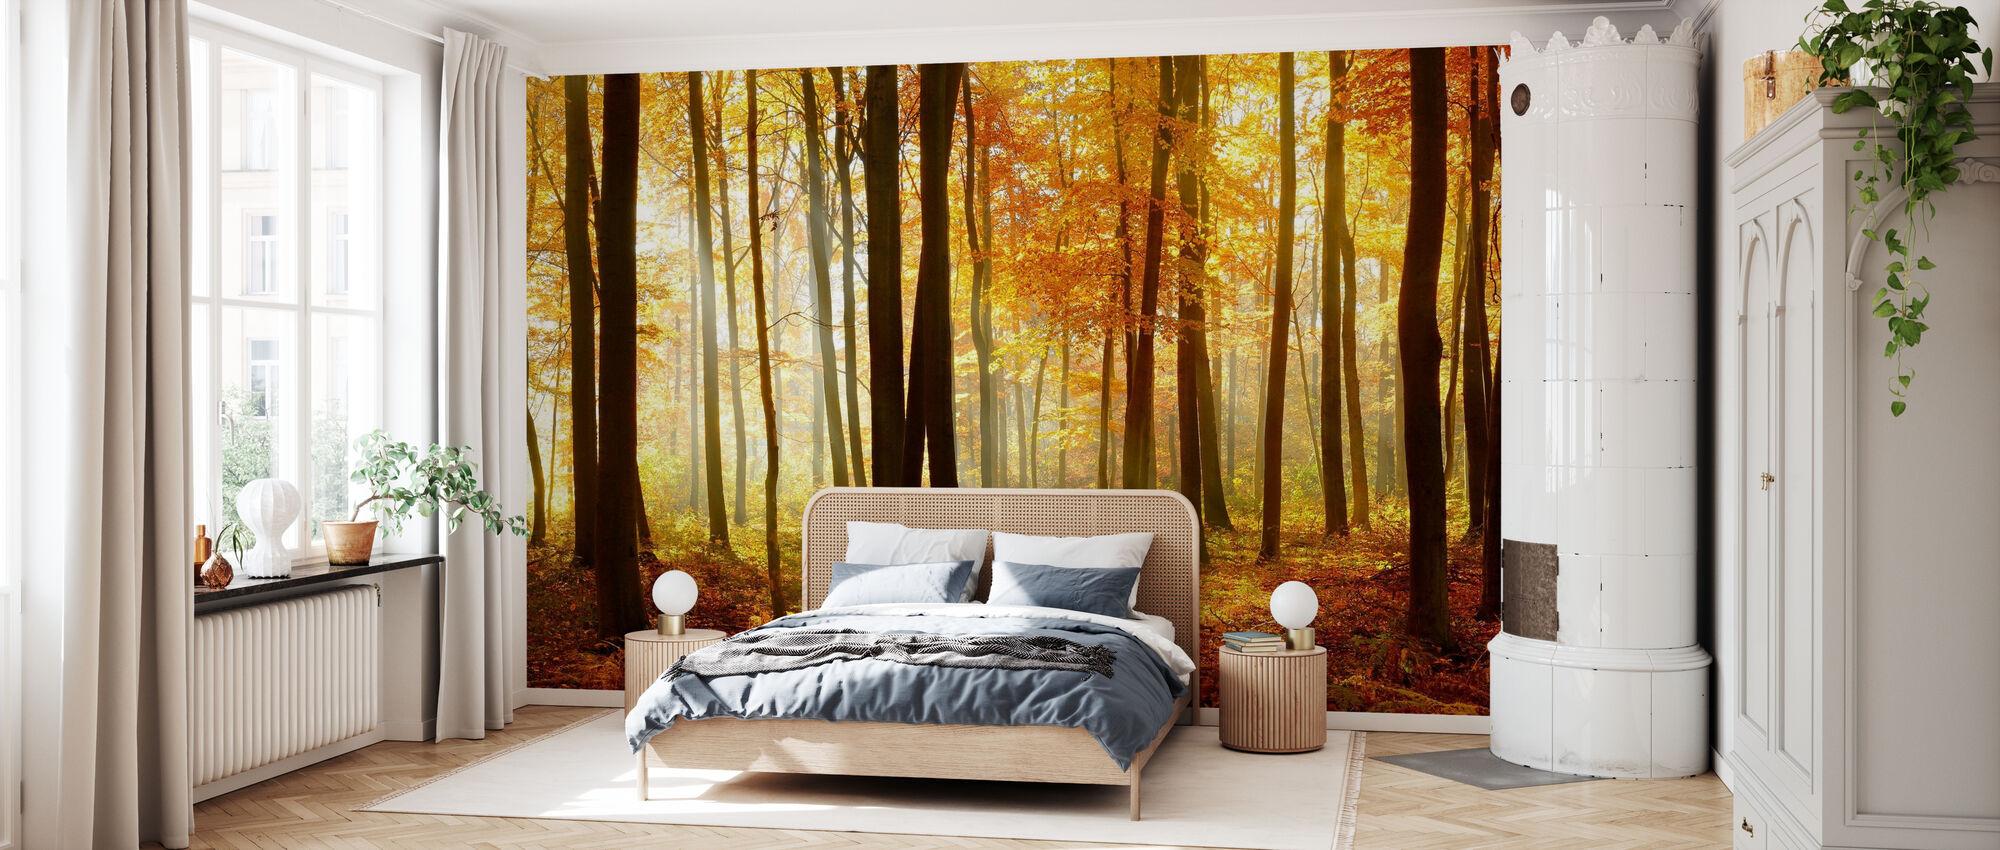 Japanese Forest - Wallpaper - Bedroom